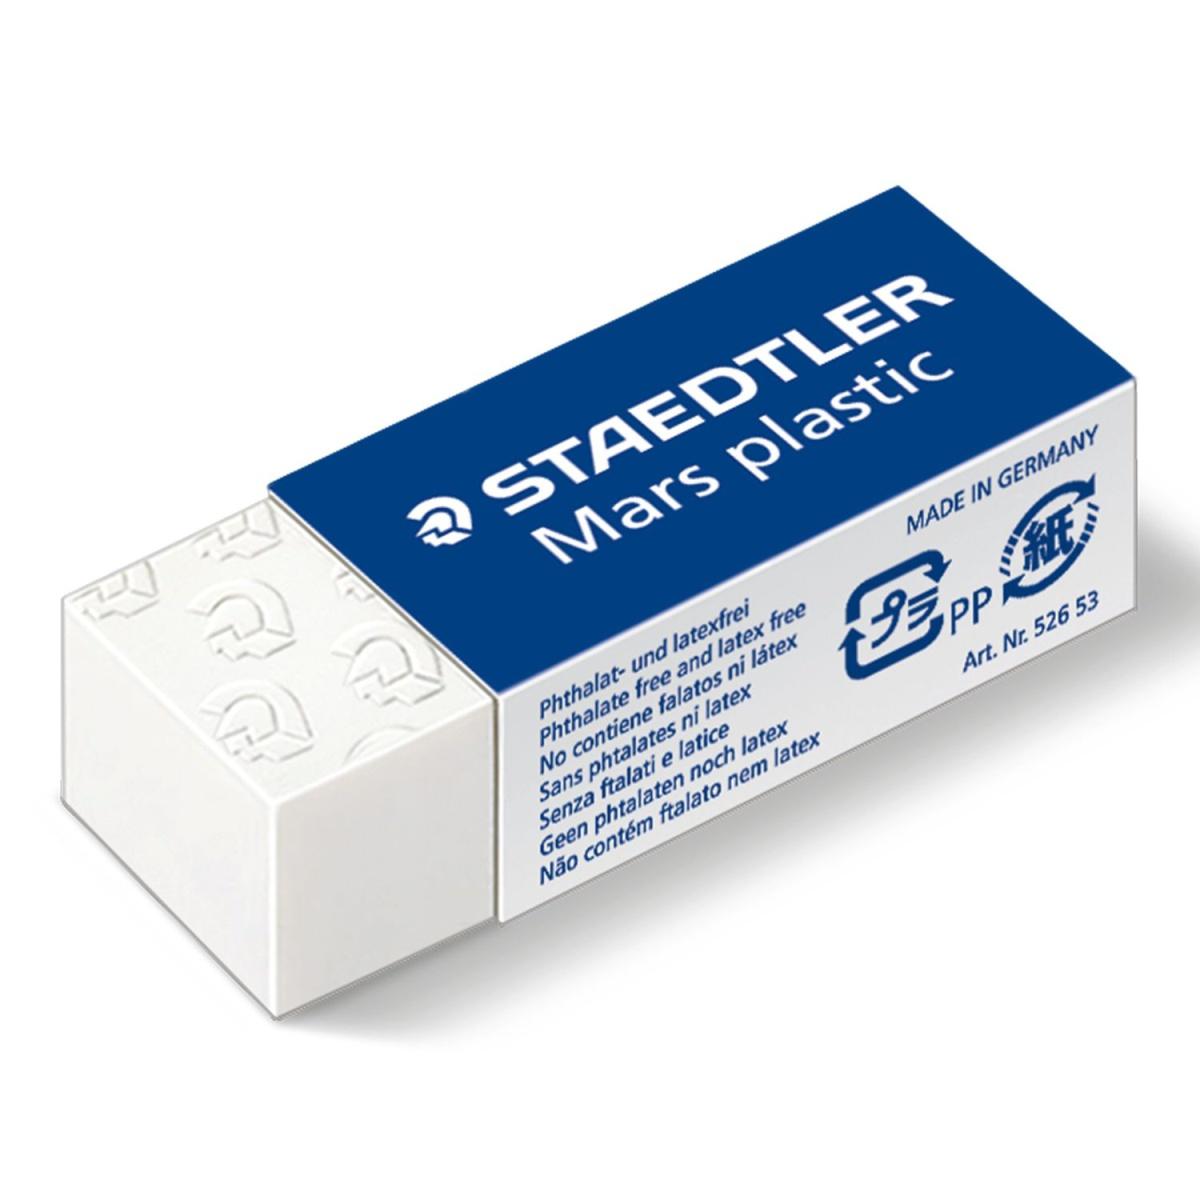 Borracha Staedtler Mars Plastic Soft 2 Unidades